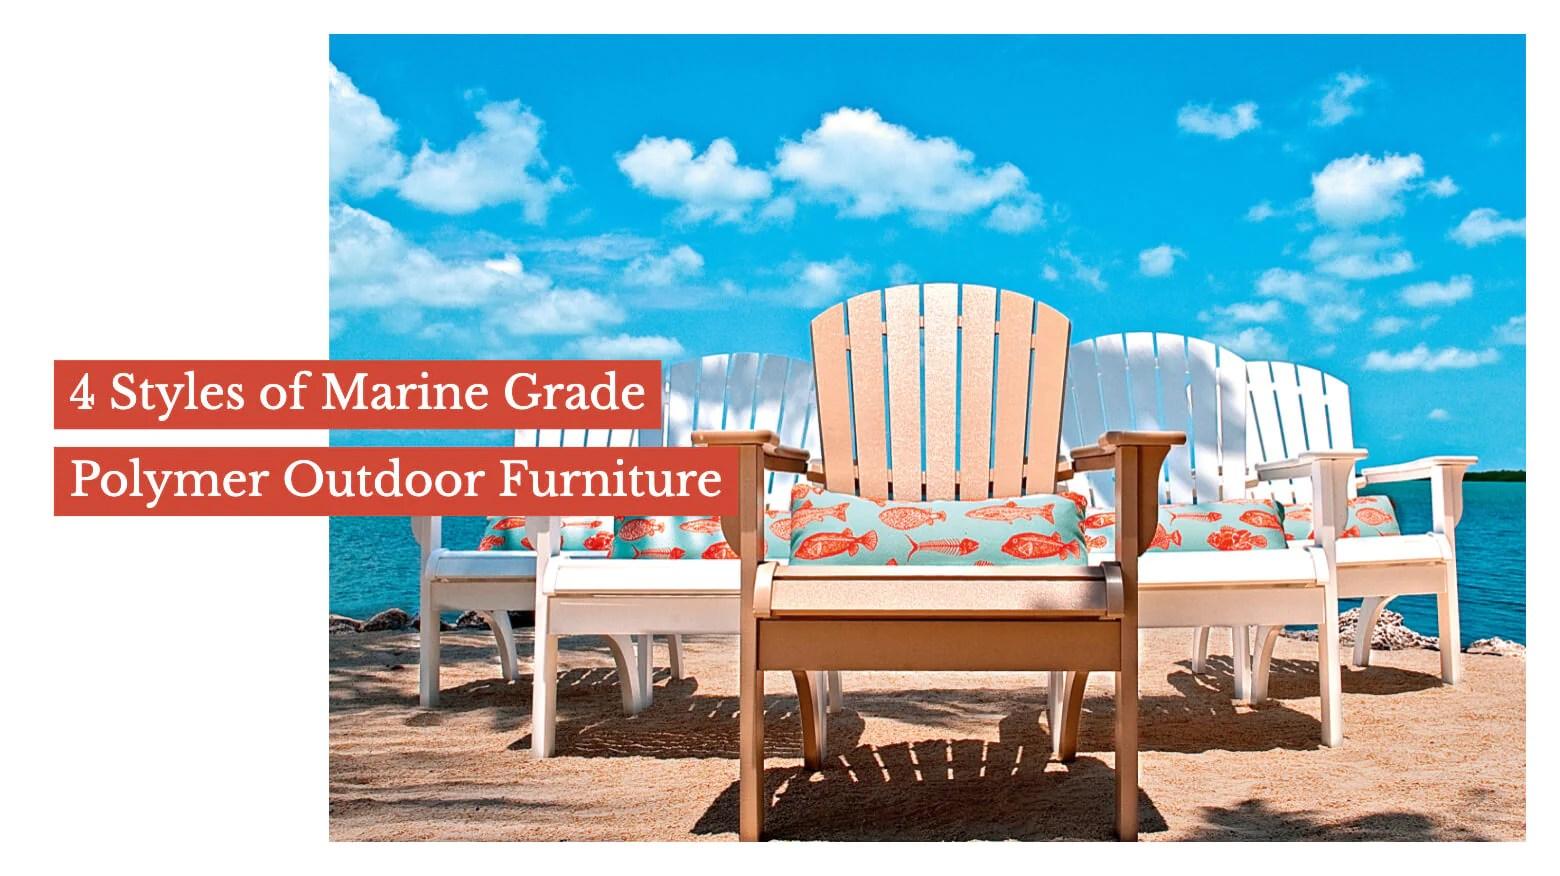 marine grade polymer outdoor furniture